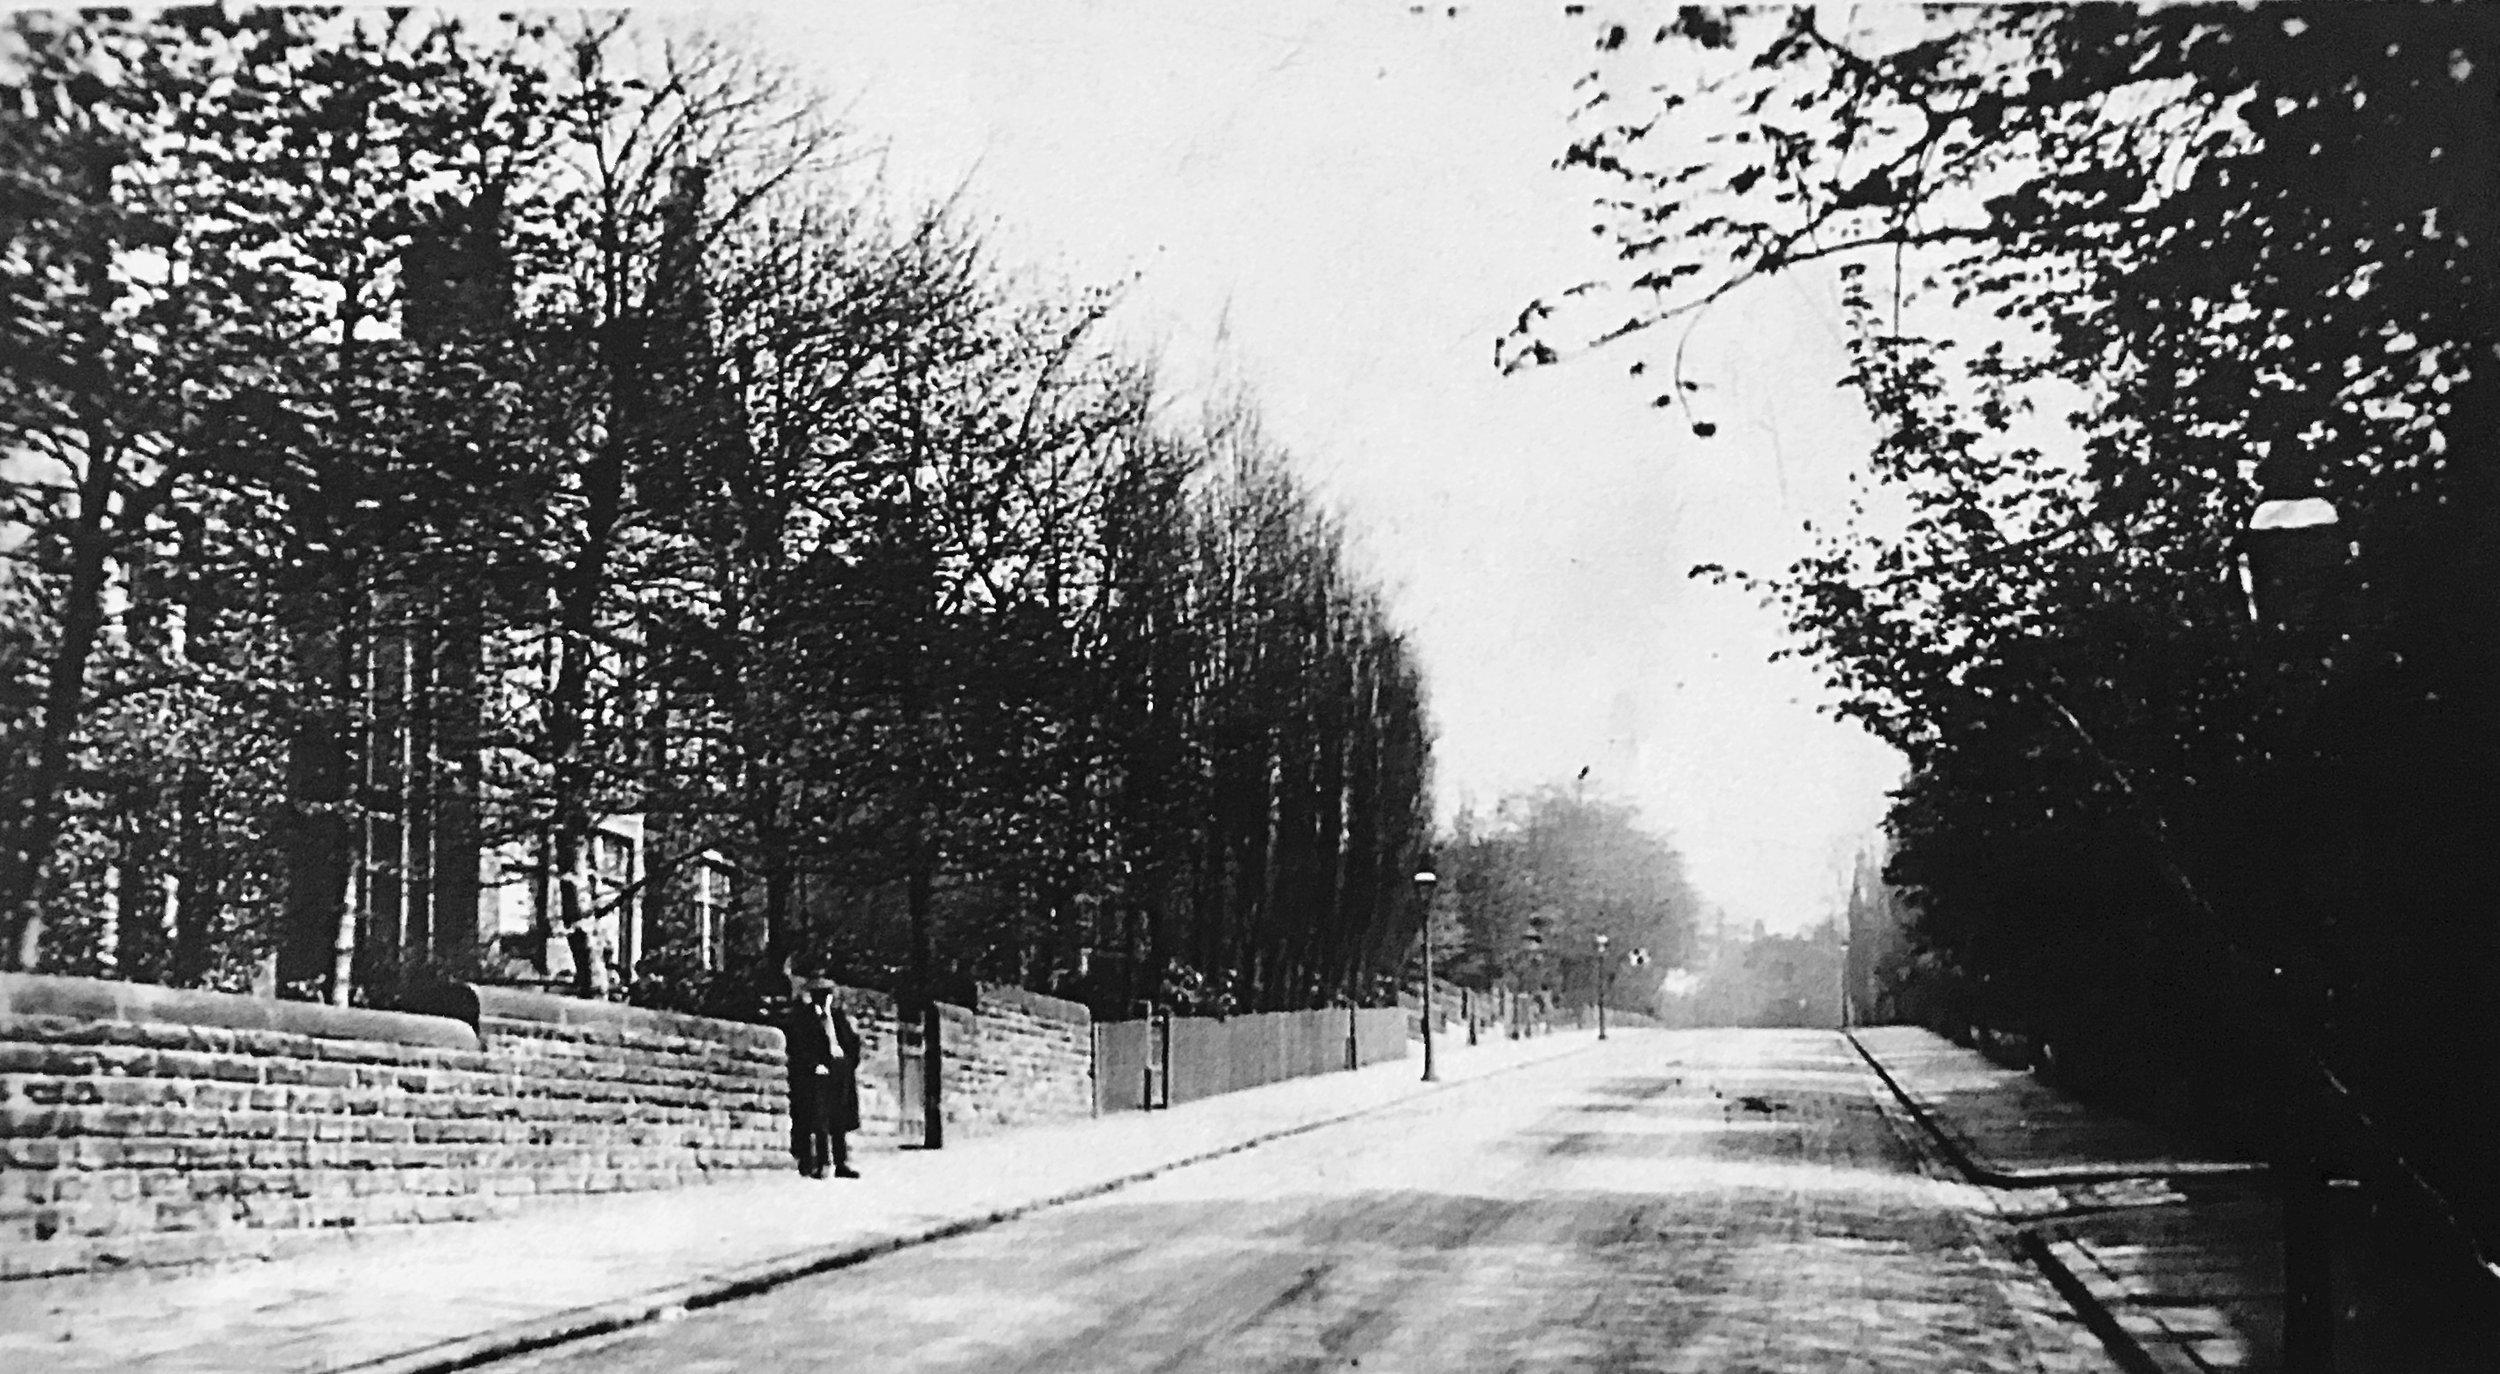 Bainbrigge Road, from Cardigan Road